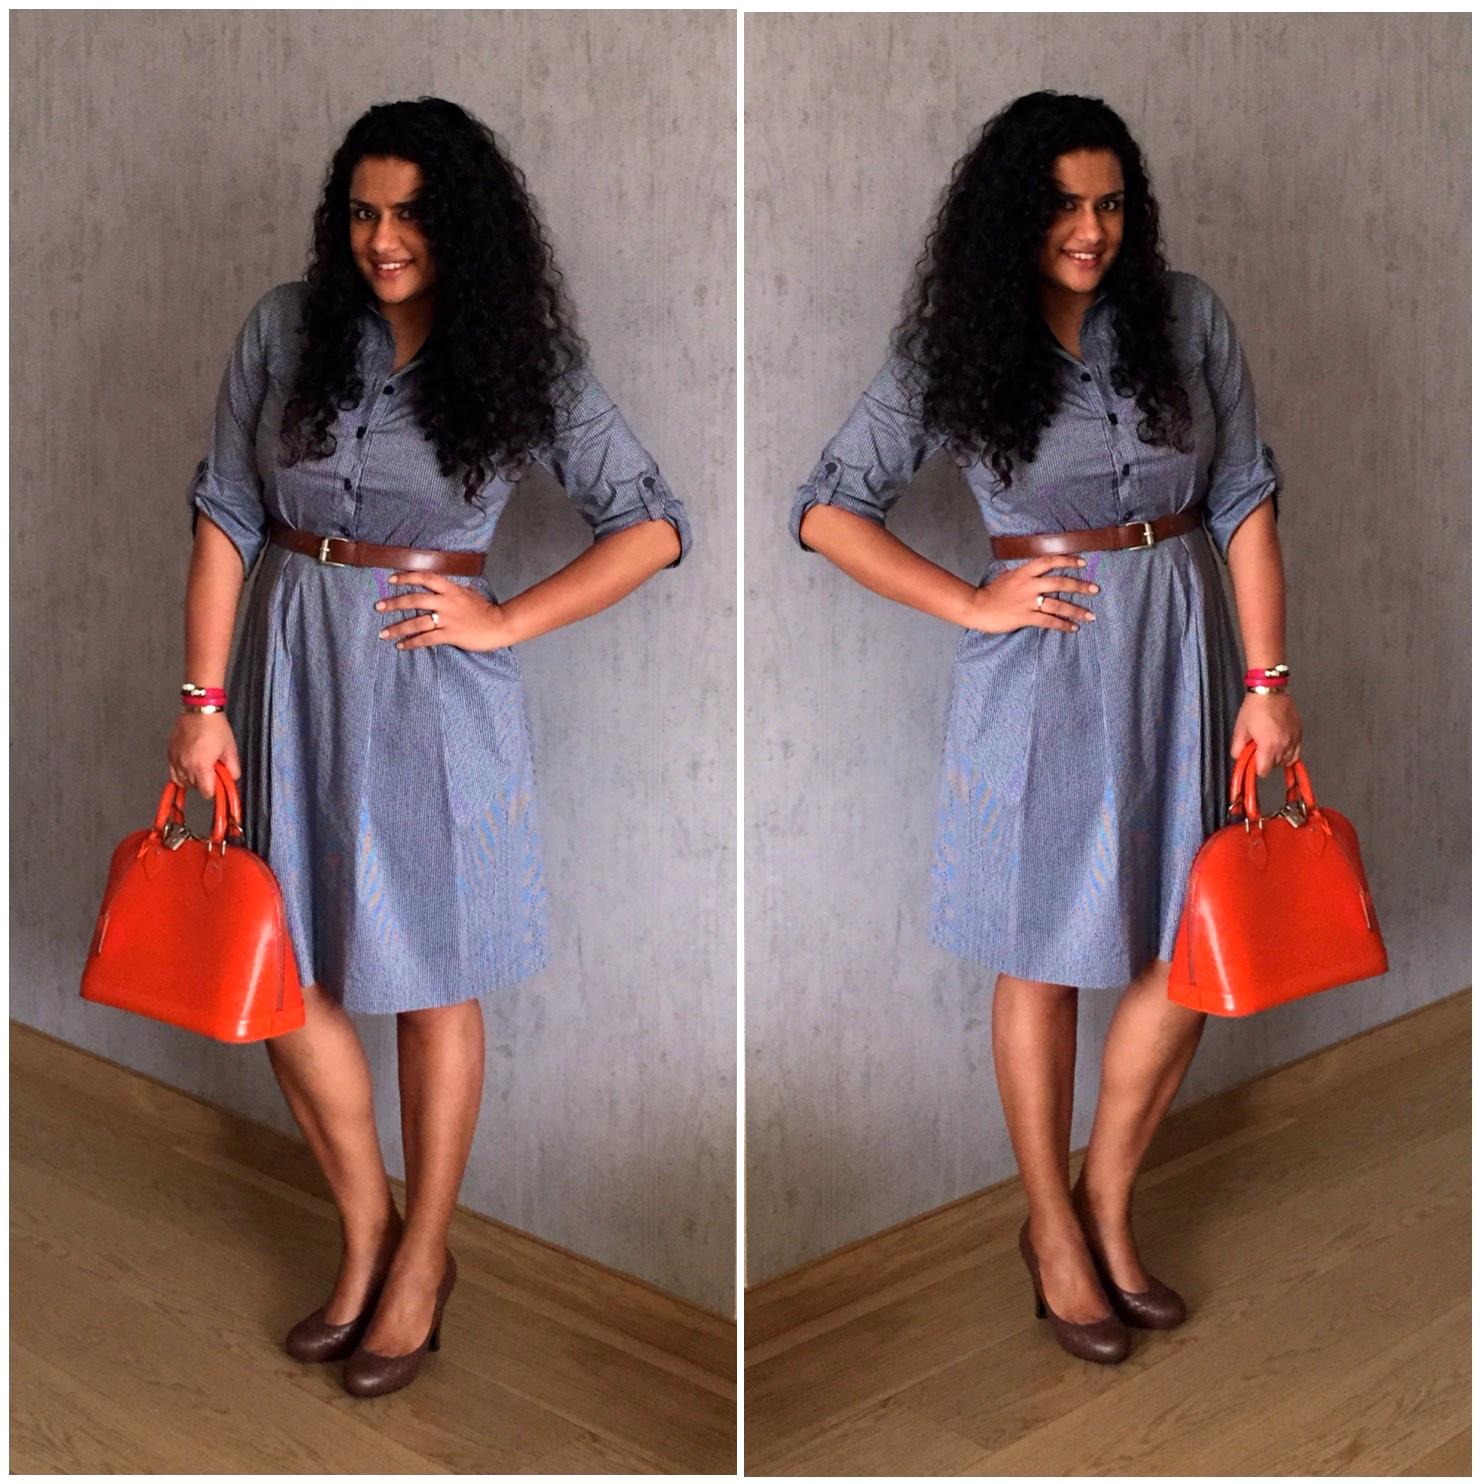 Dress: Tory Burch, Bag: Louis Vuitton, Shoes: Bottega Veneta, Belt: Michael by Michael Kors, Leather Bracelet: Bulgari, Gold Bracelet: Cartier